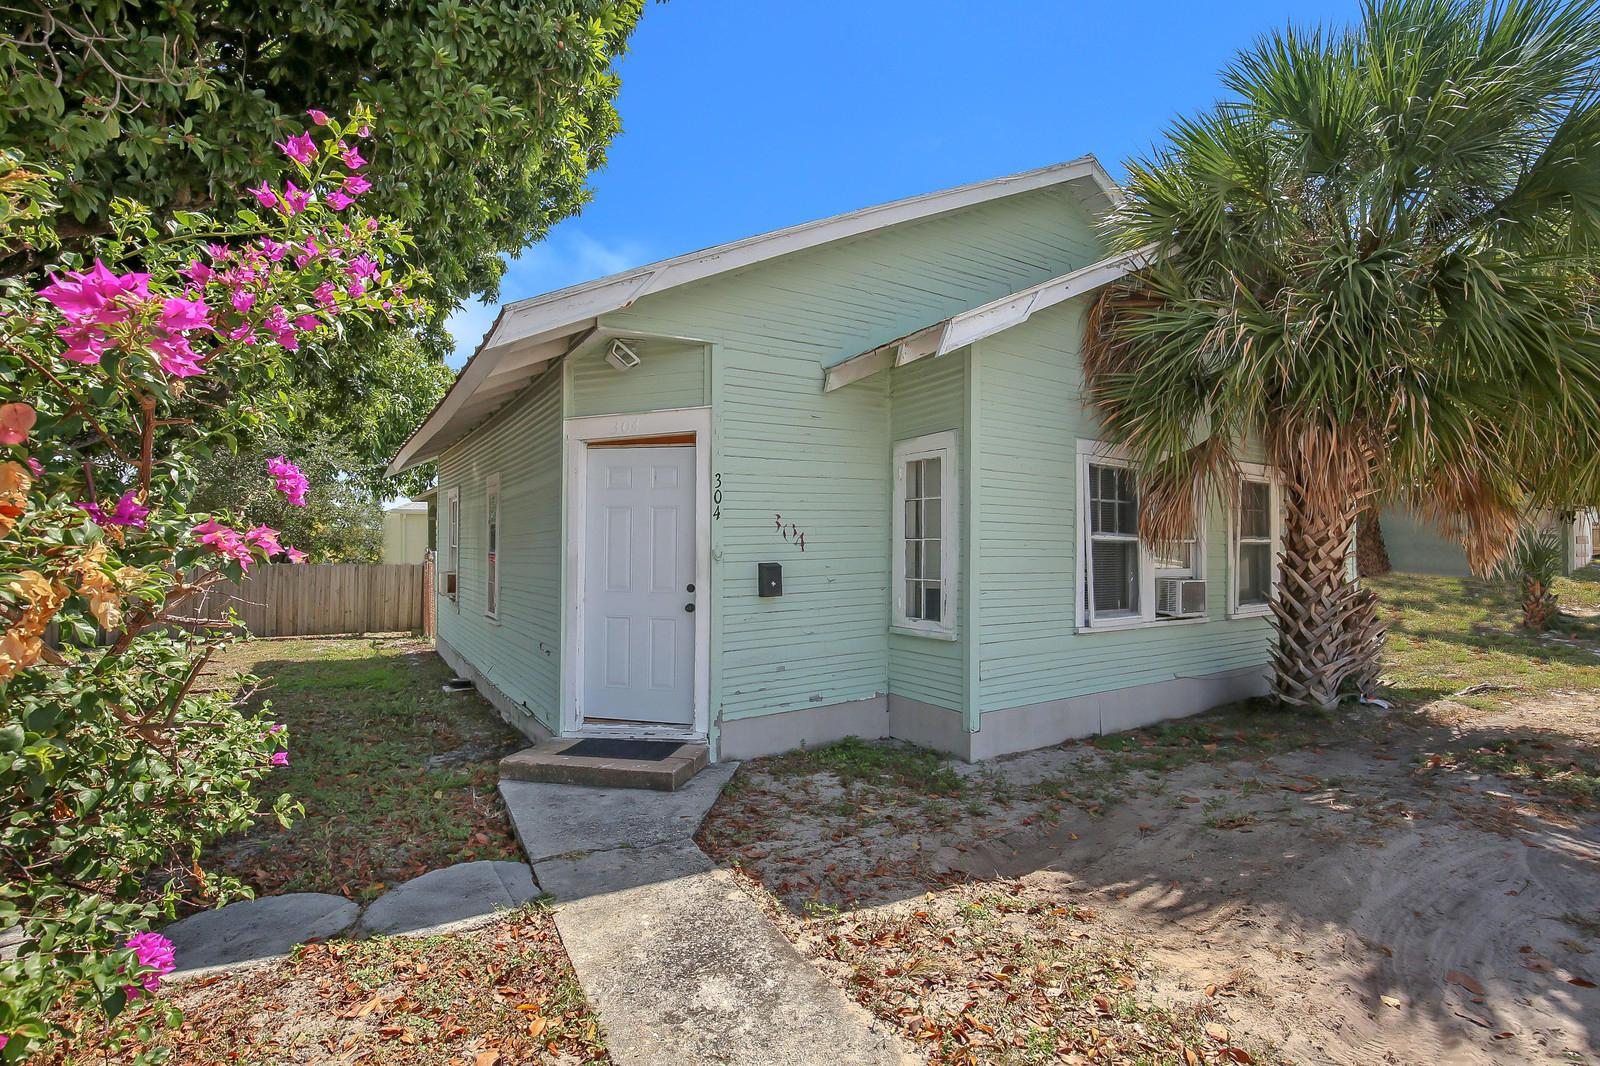 Home for sale in Bowers Park Boynton Beach Florida